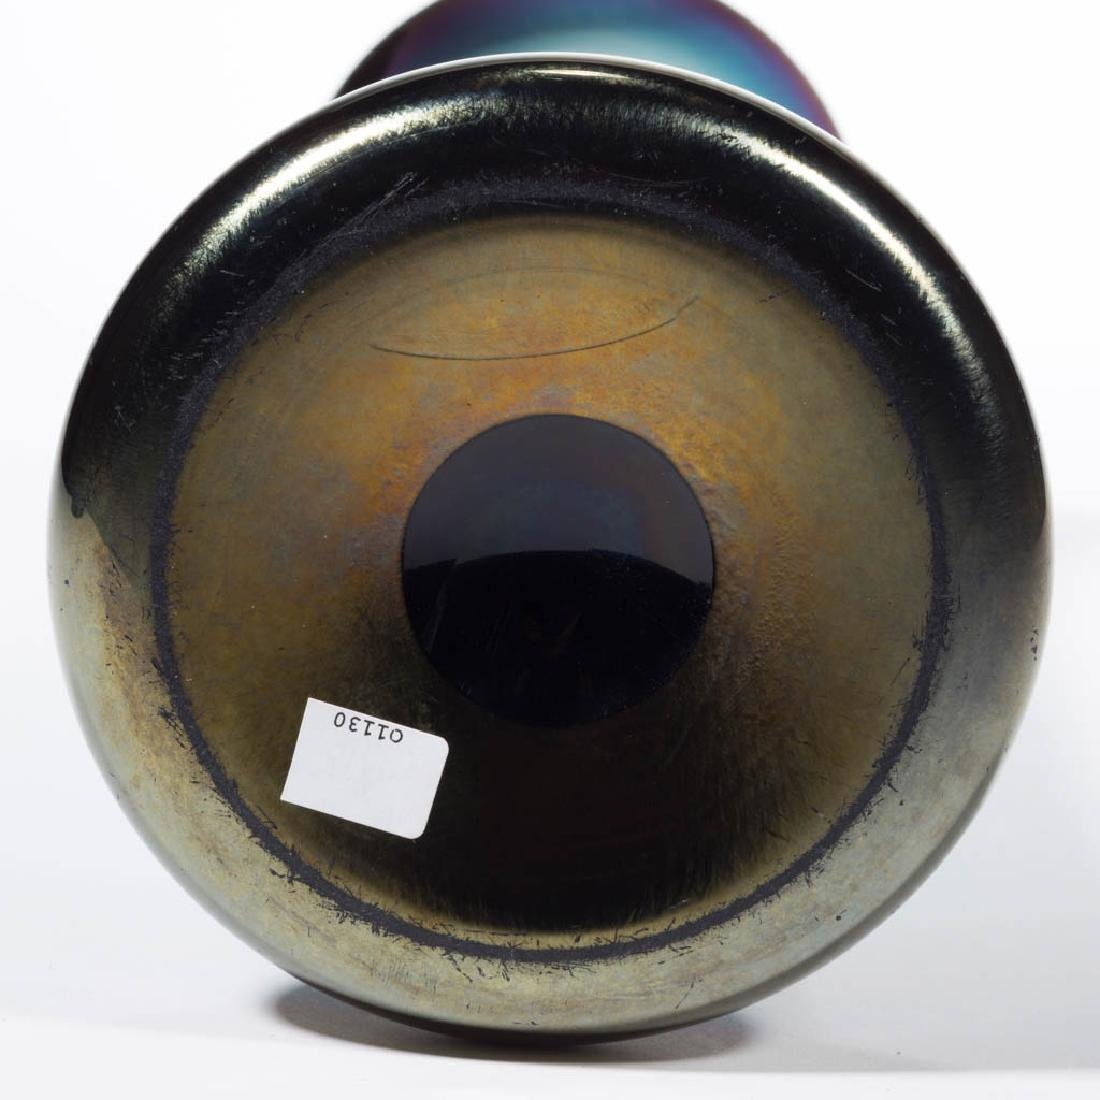 IMPERIAL LEAD LUSTRE IRIDESCENT ART GLASS VASE - 2